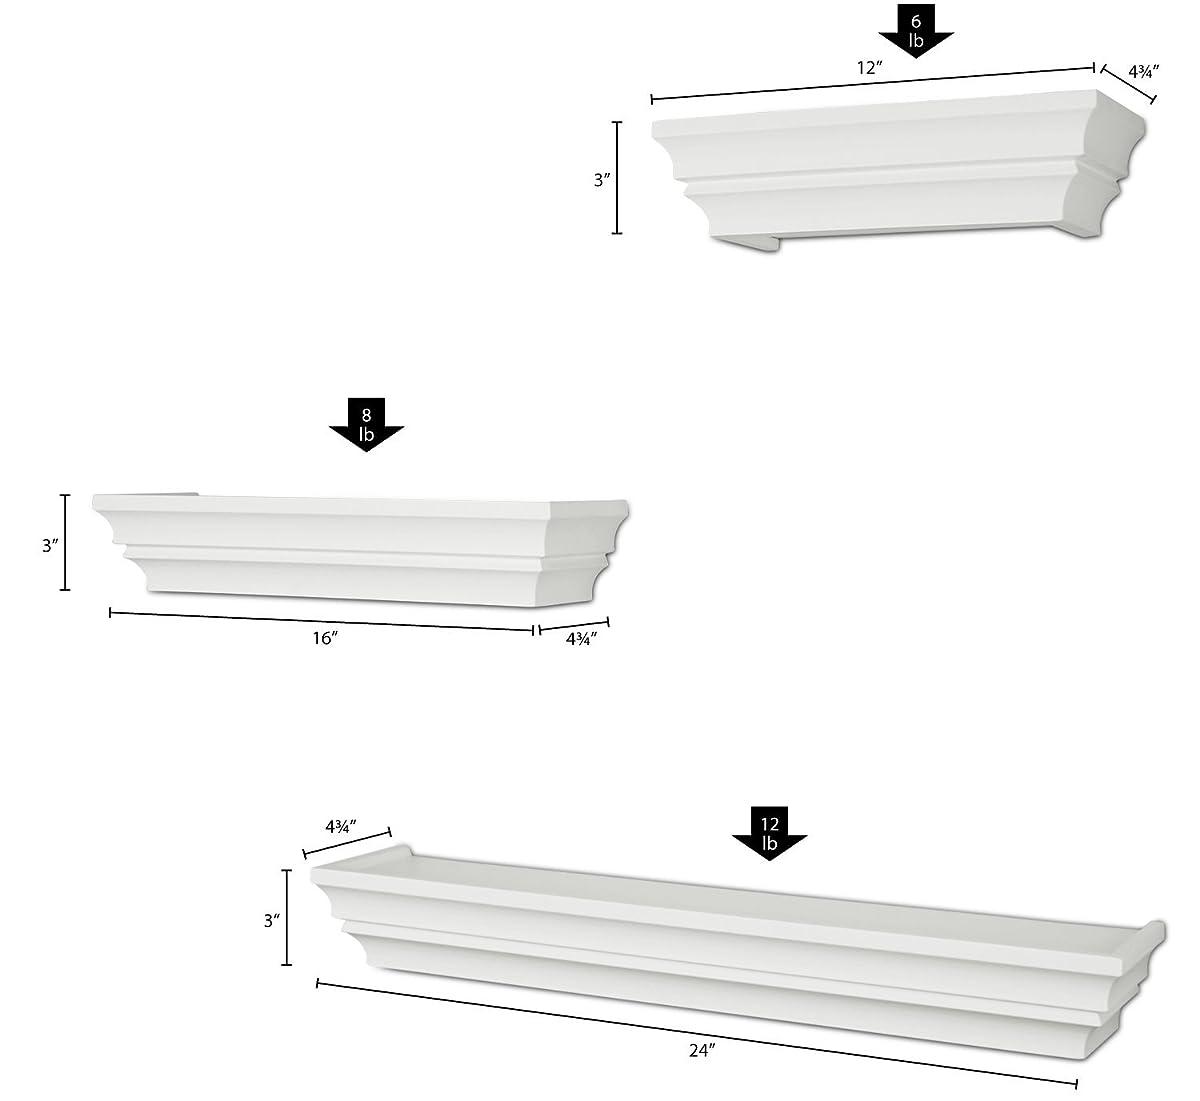 "Ballucci Victorian Wall Ledge and Shelf, 12"", 16"", 24"", Set of 3, White"